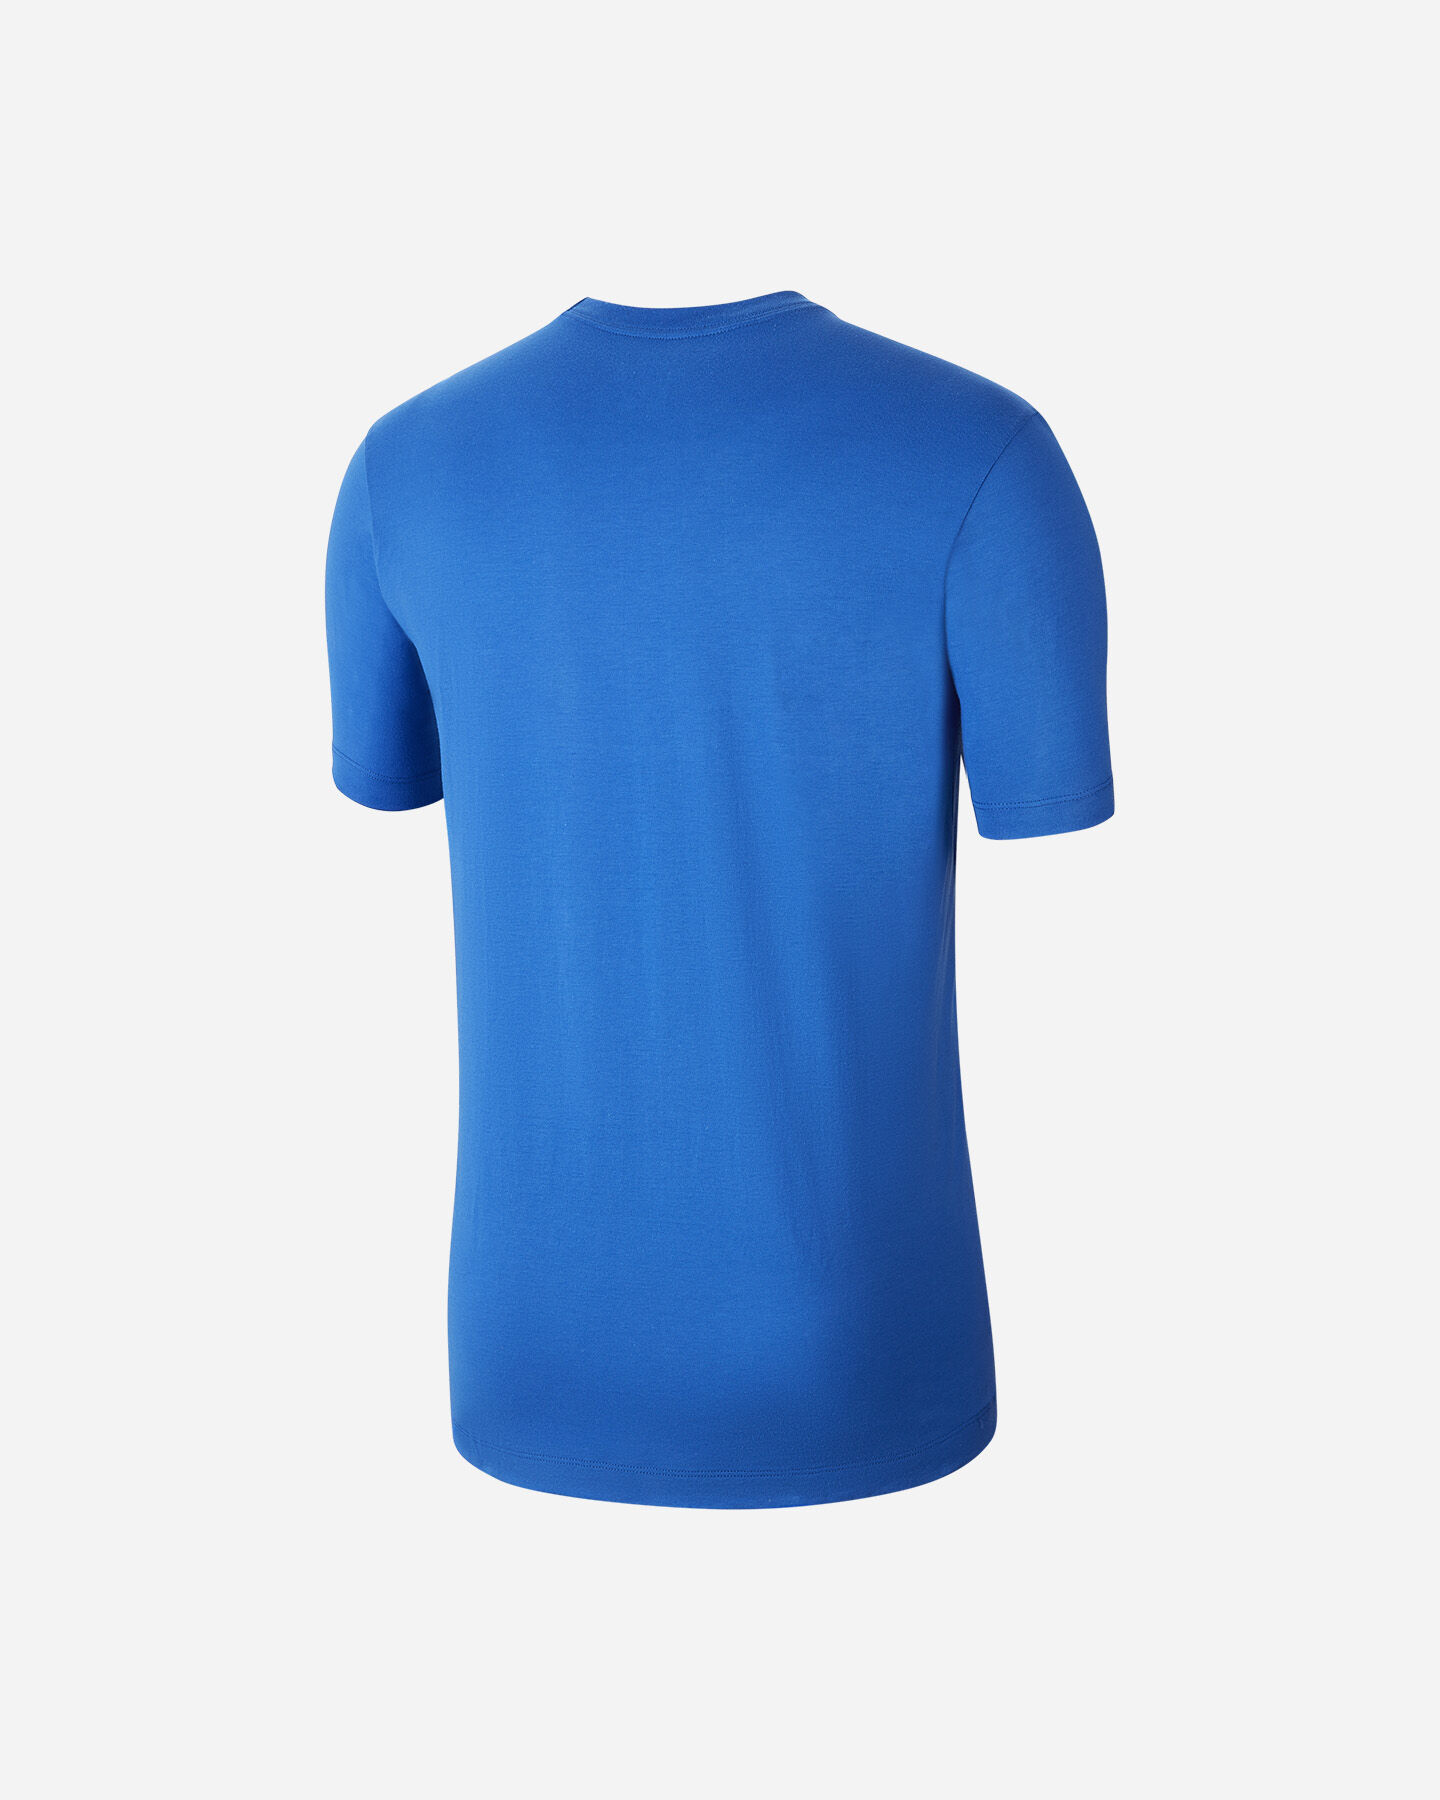 T-Shirt NIKE LOGO PREHEAT FLAG  M S5196432 scatto 1